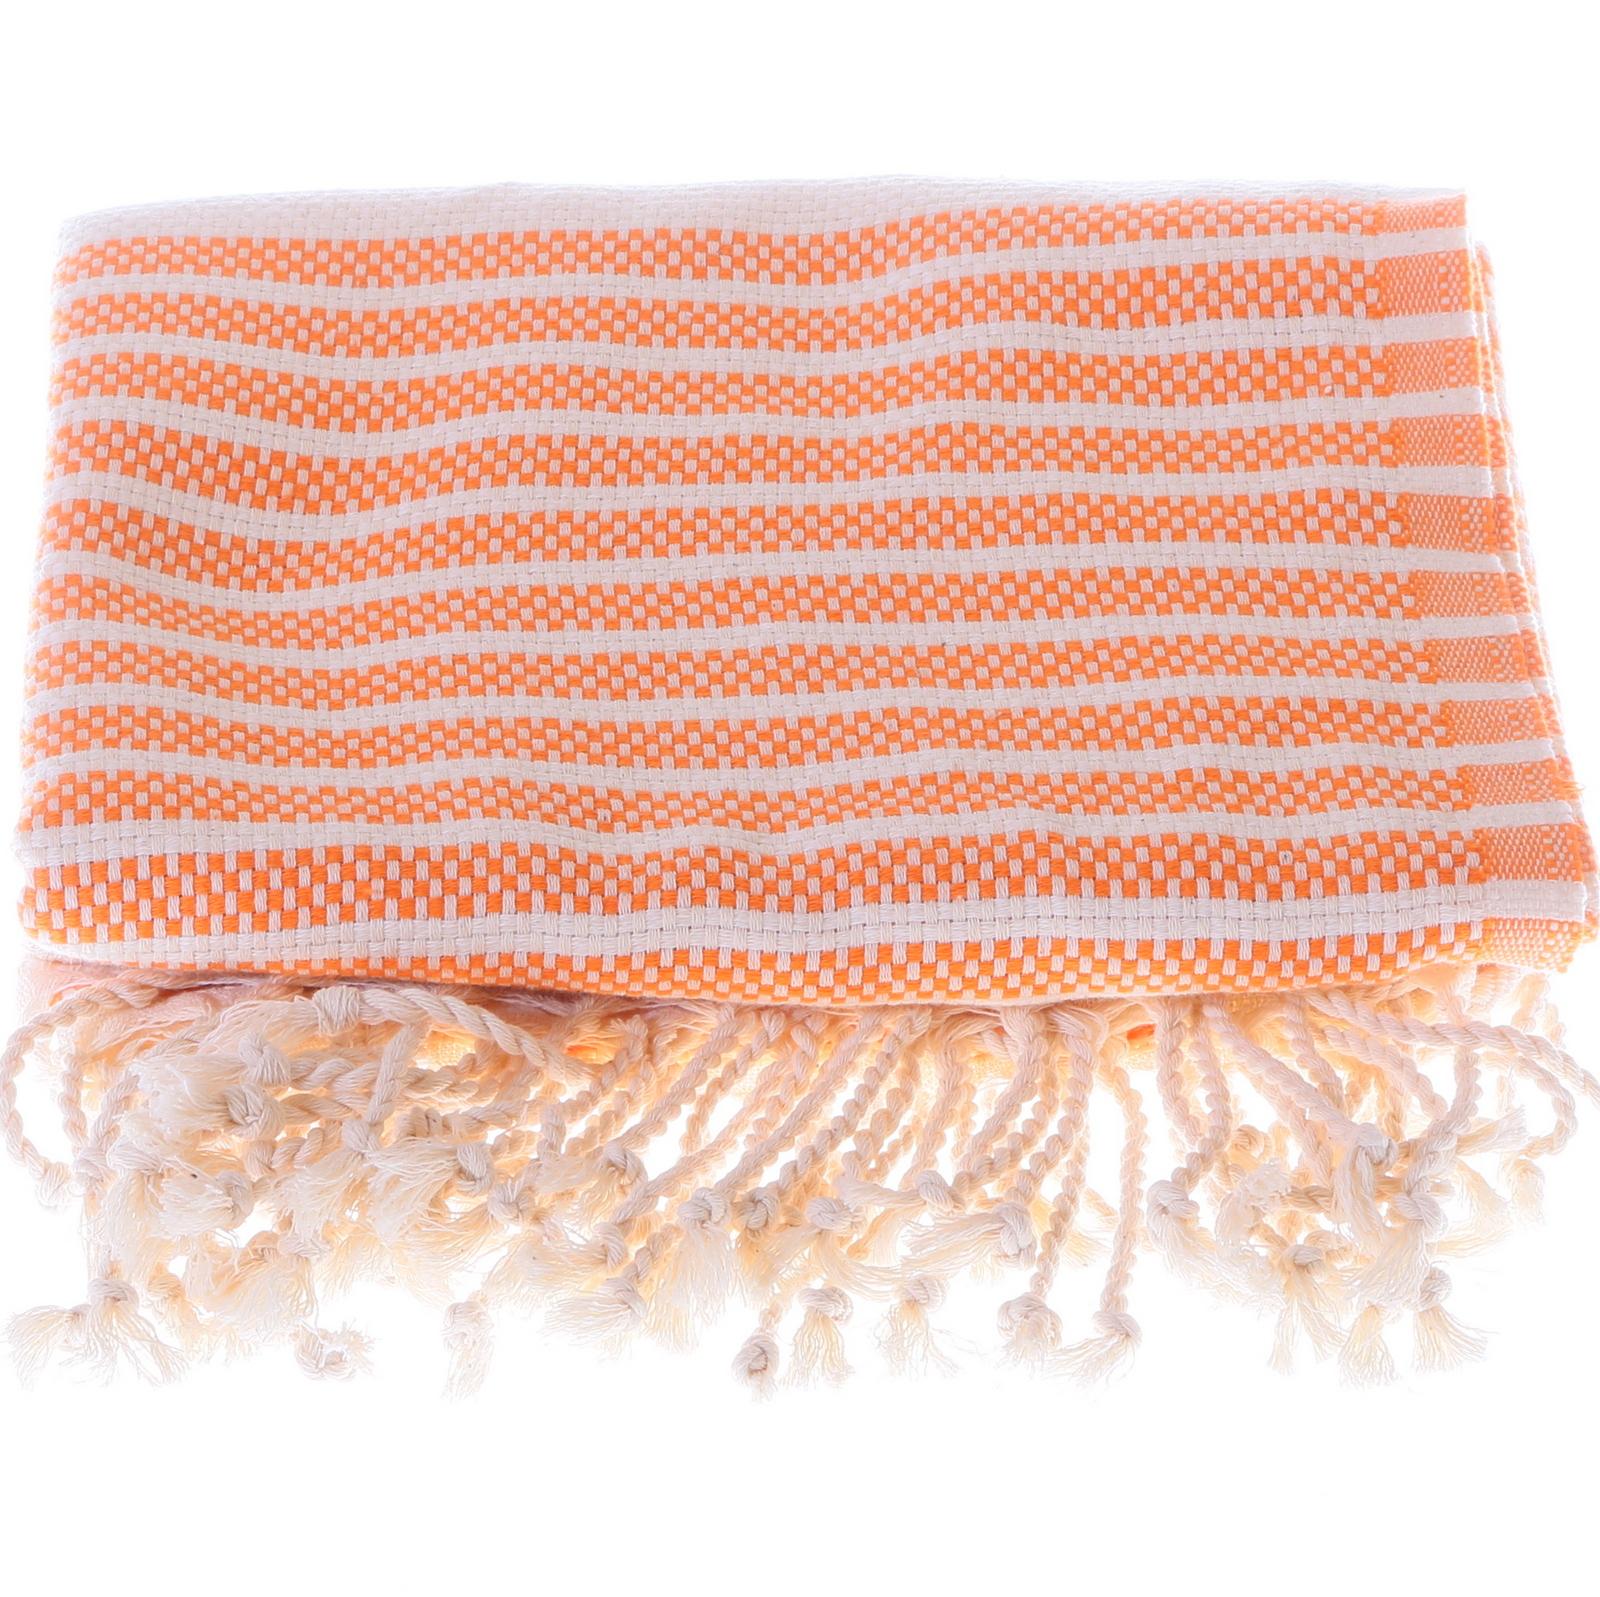 Marmara style 100% cotton hammam towel in orange